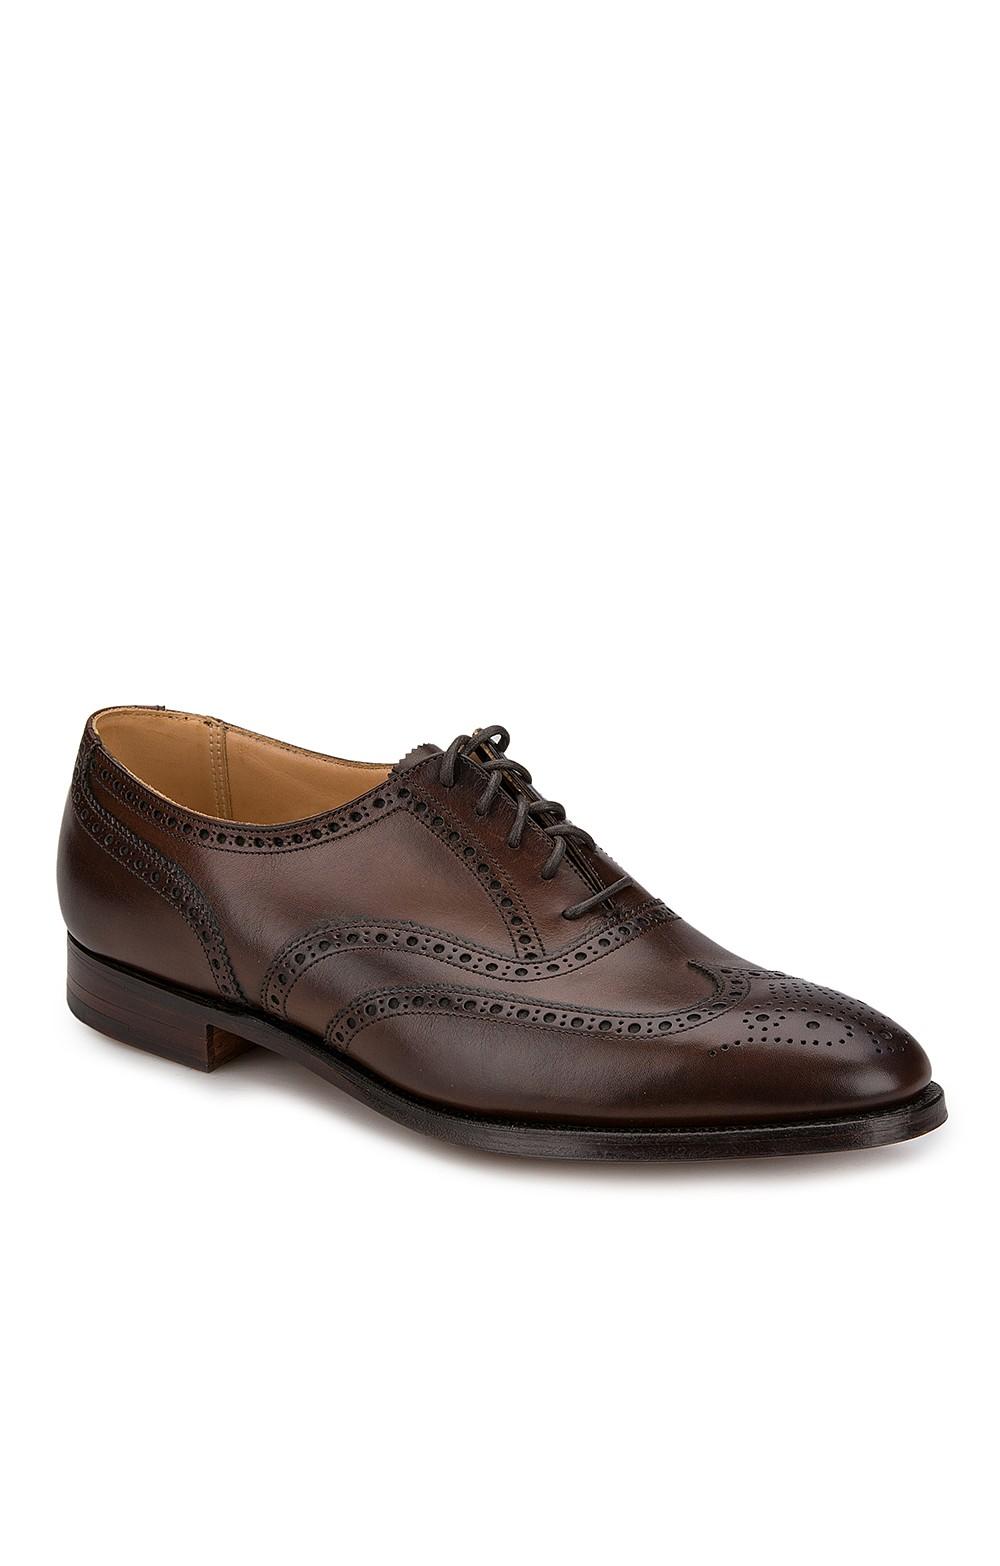 Mens Crockett And Jones Finsbury Shoe